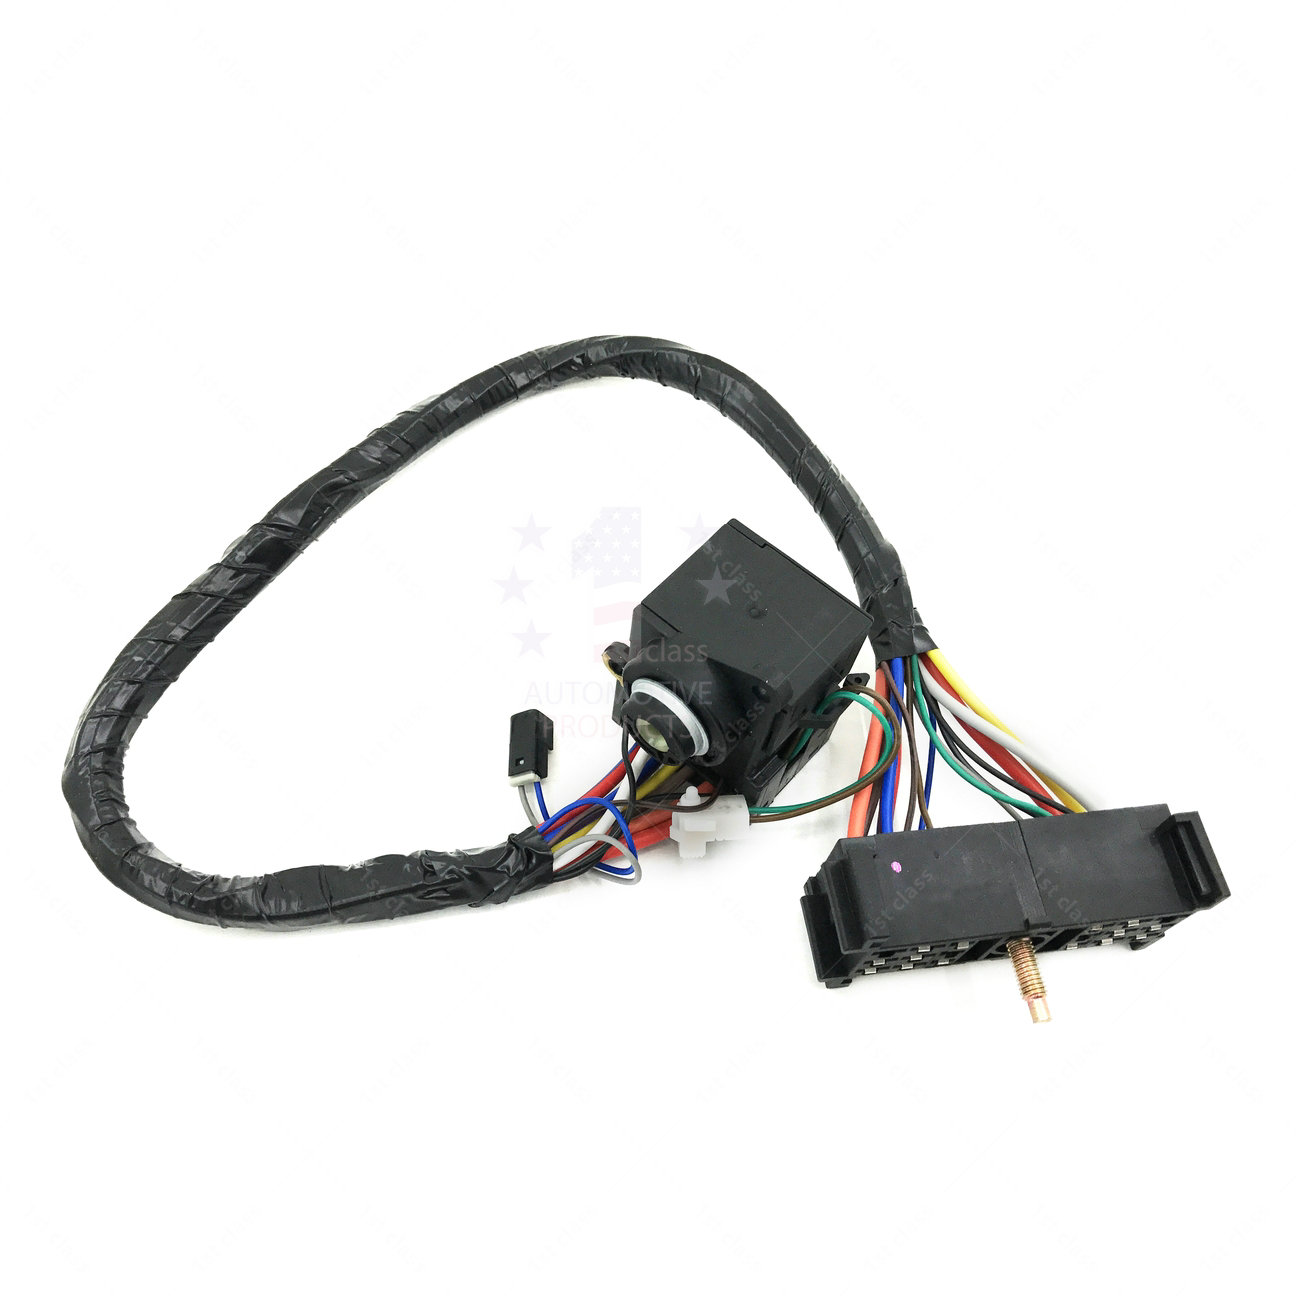 Chevrolet Starter Wiring